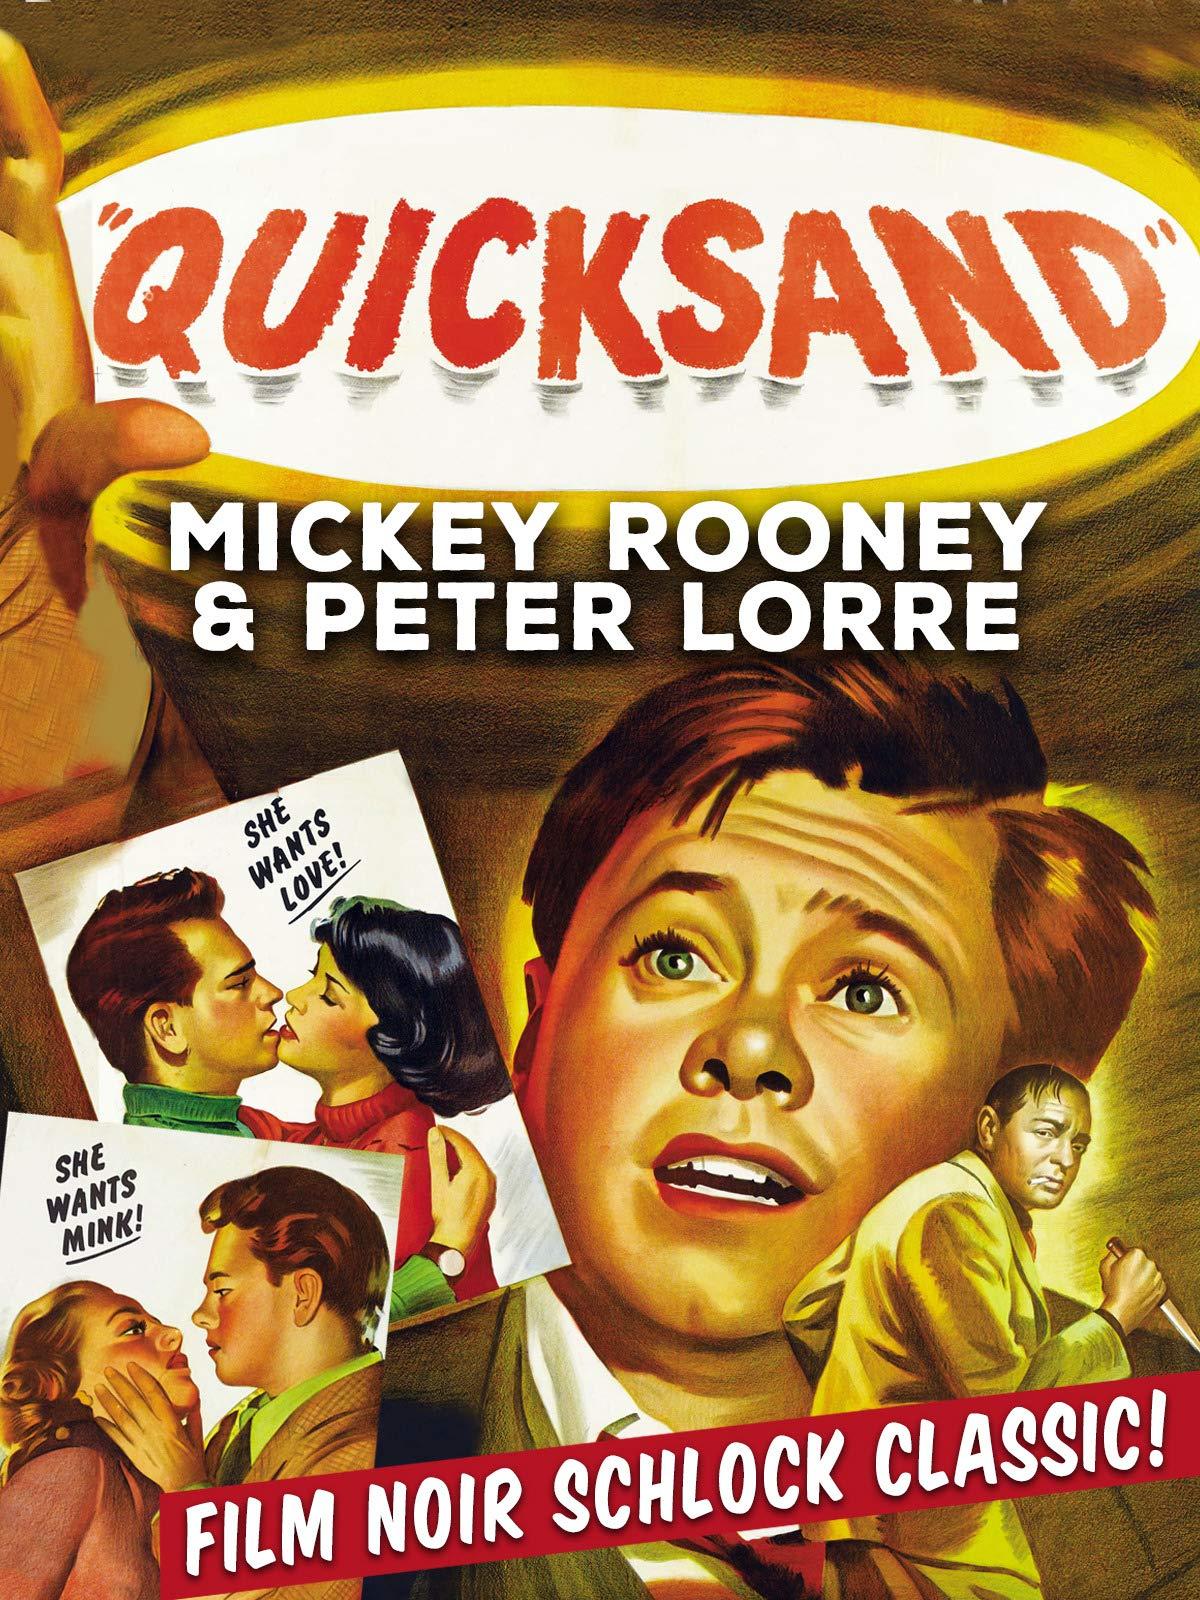 Quicksand - Mickey Rooney & Peter Lorre, Film Noir Schlock Classic!